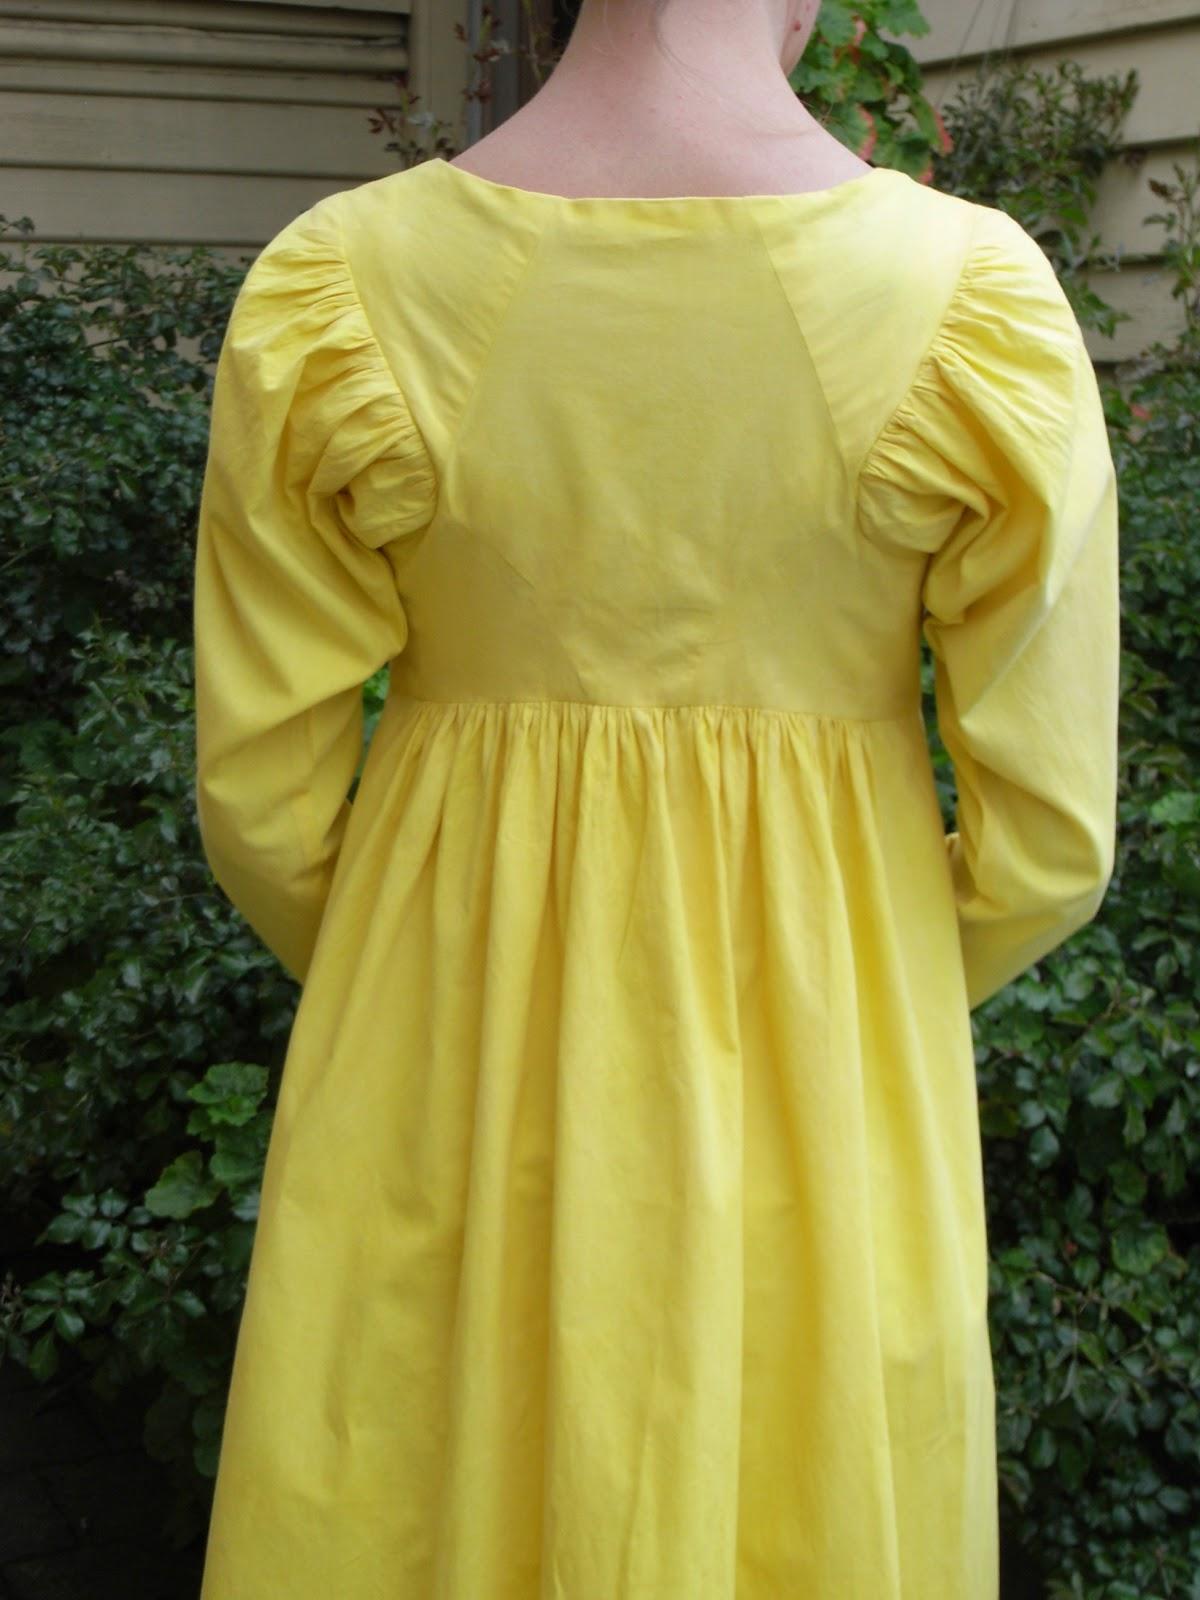 Jane Austen Regency Napoleonic Costume Construction